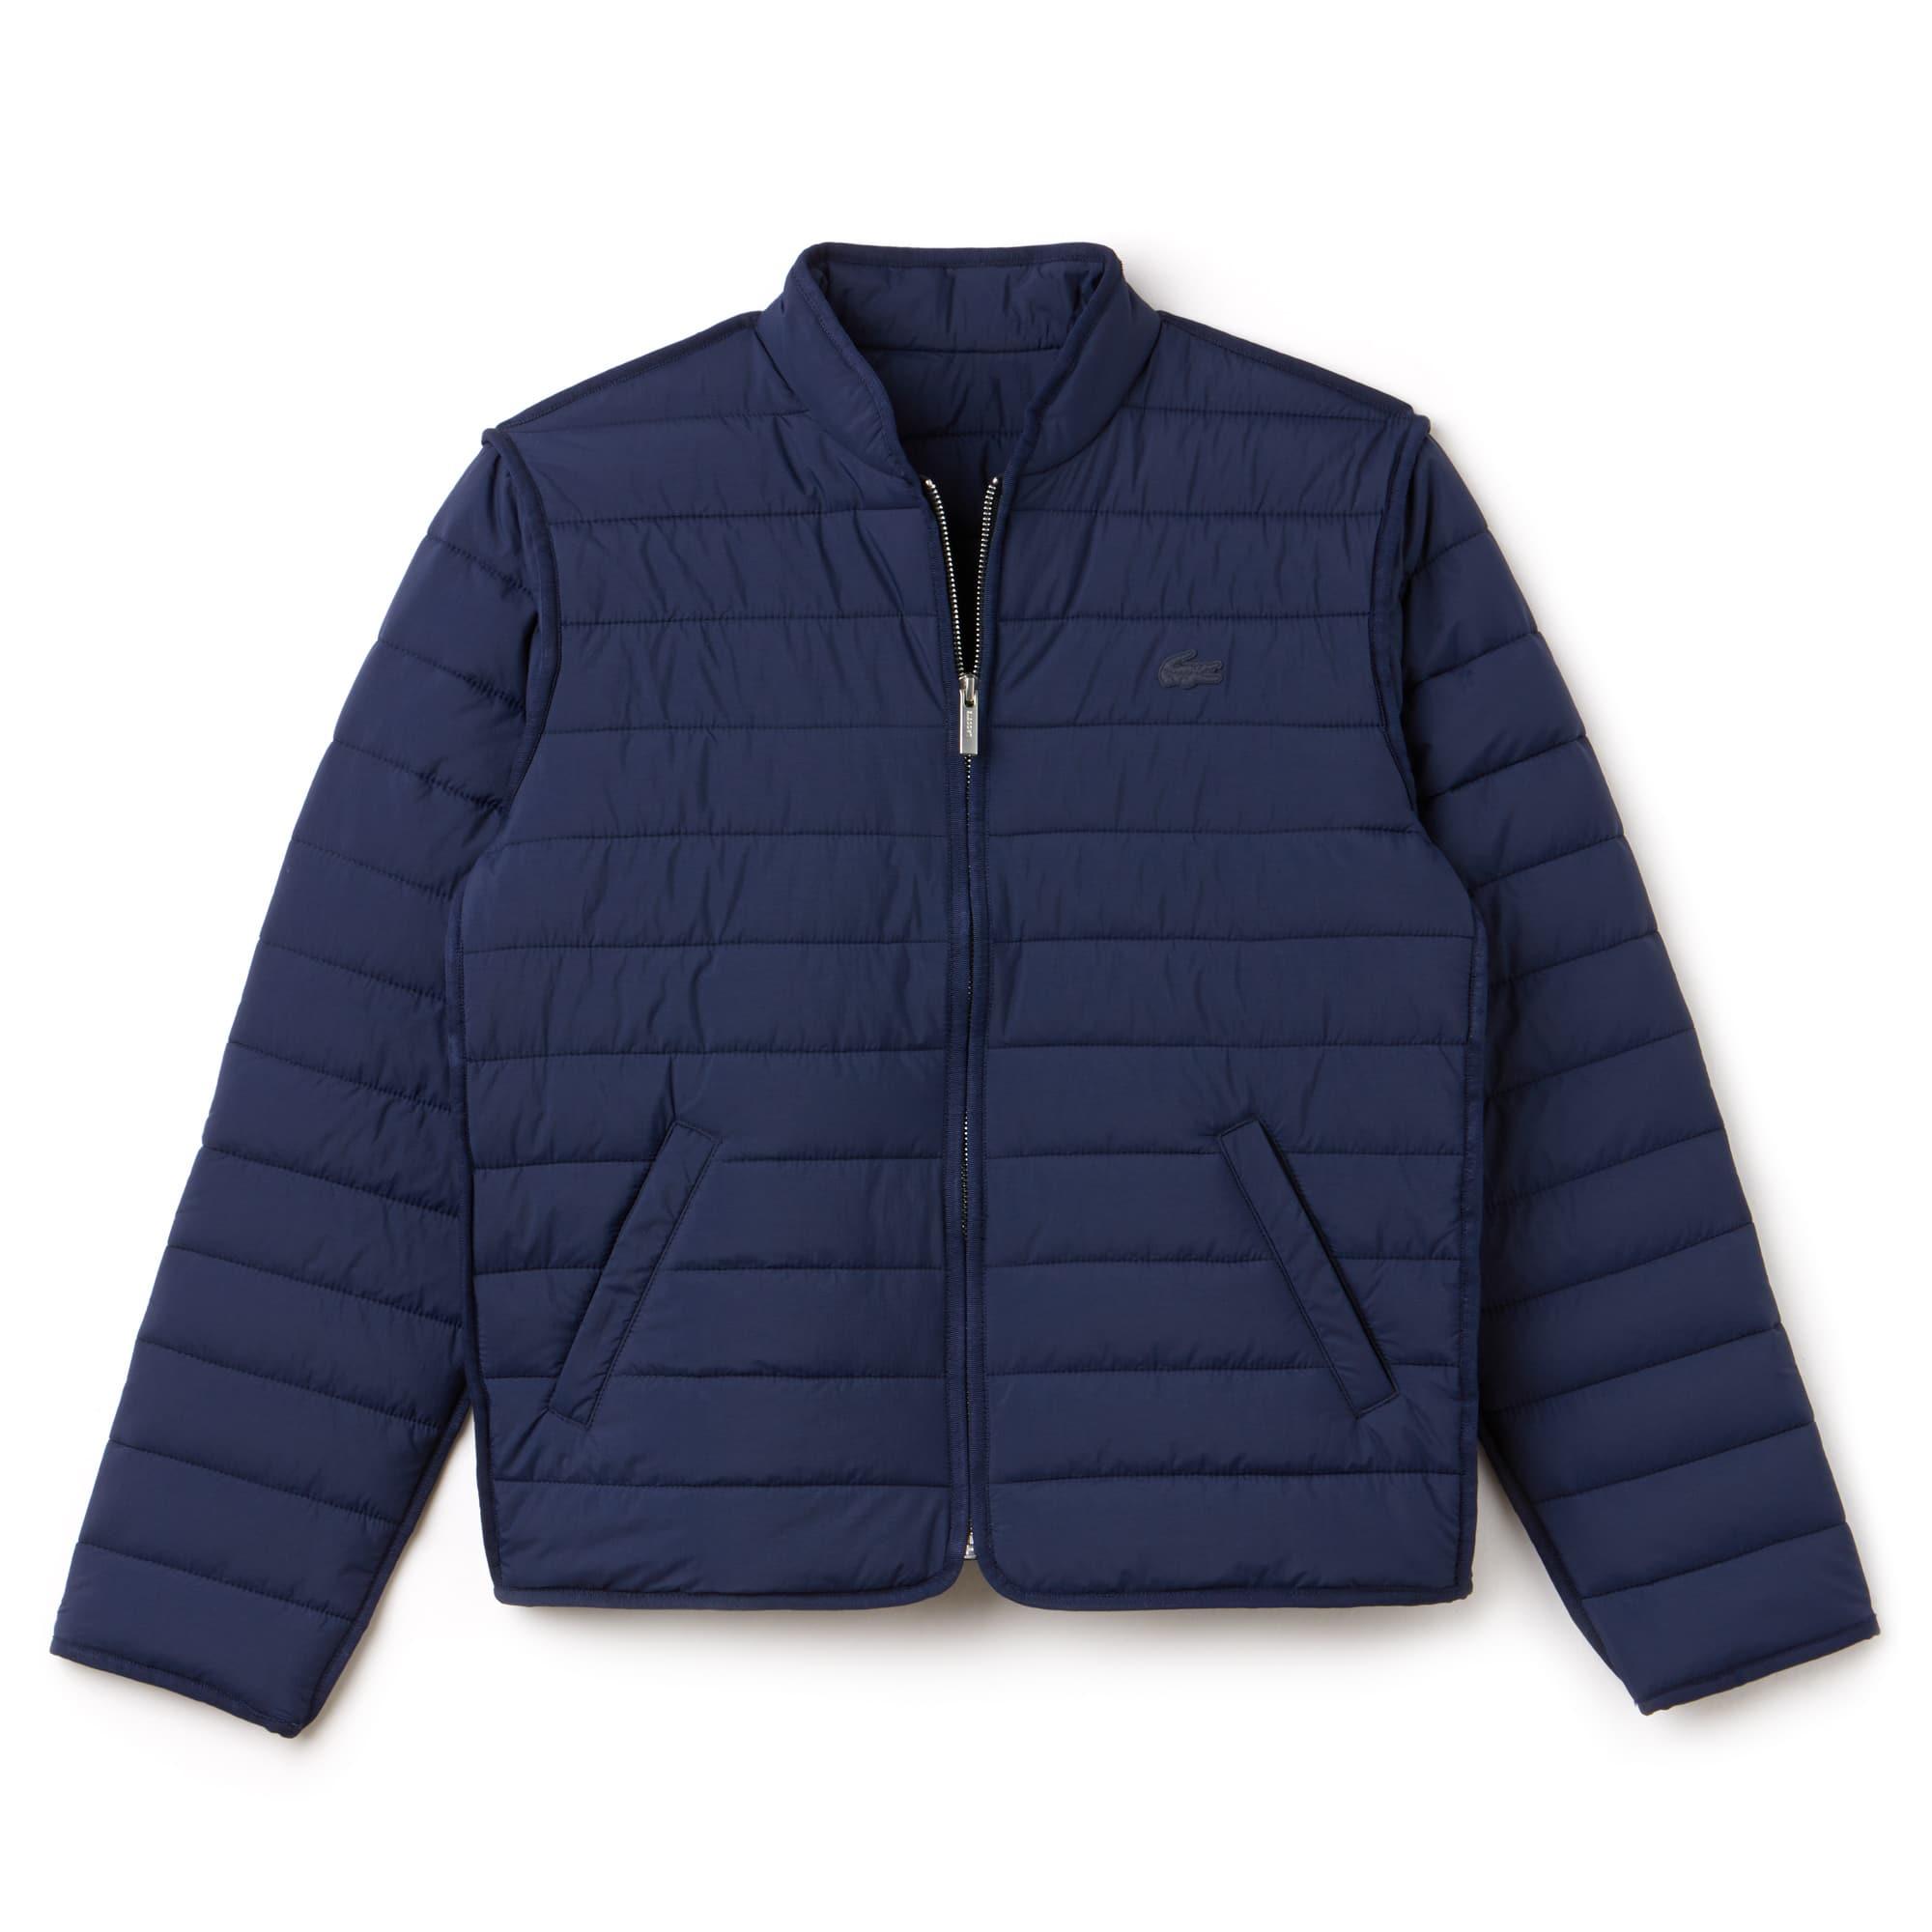 Women's Zippered Quilted Soft Taffeta Jacket